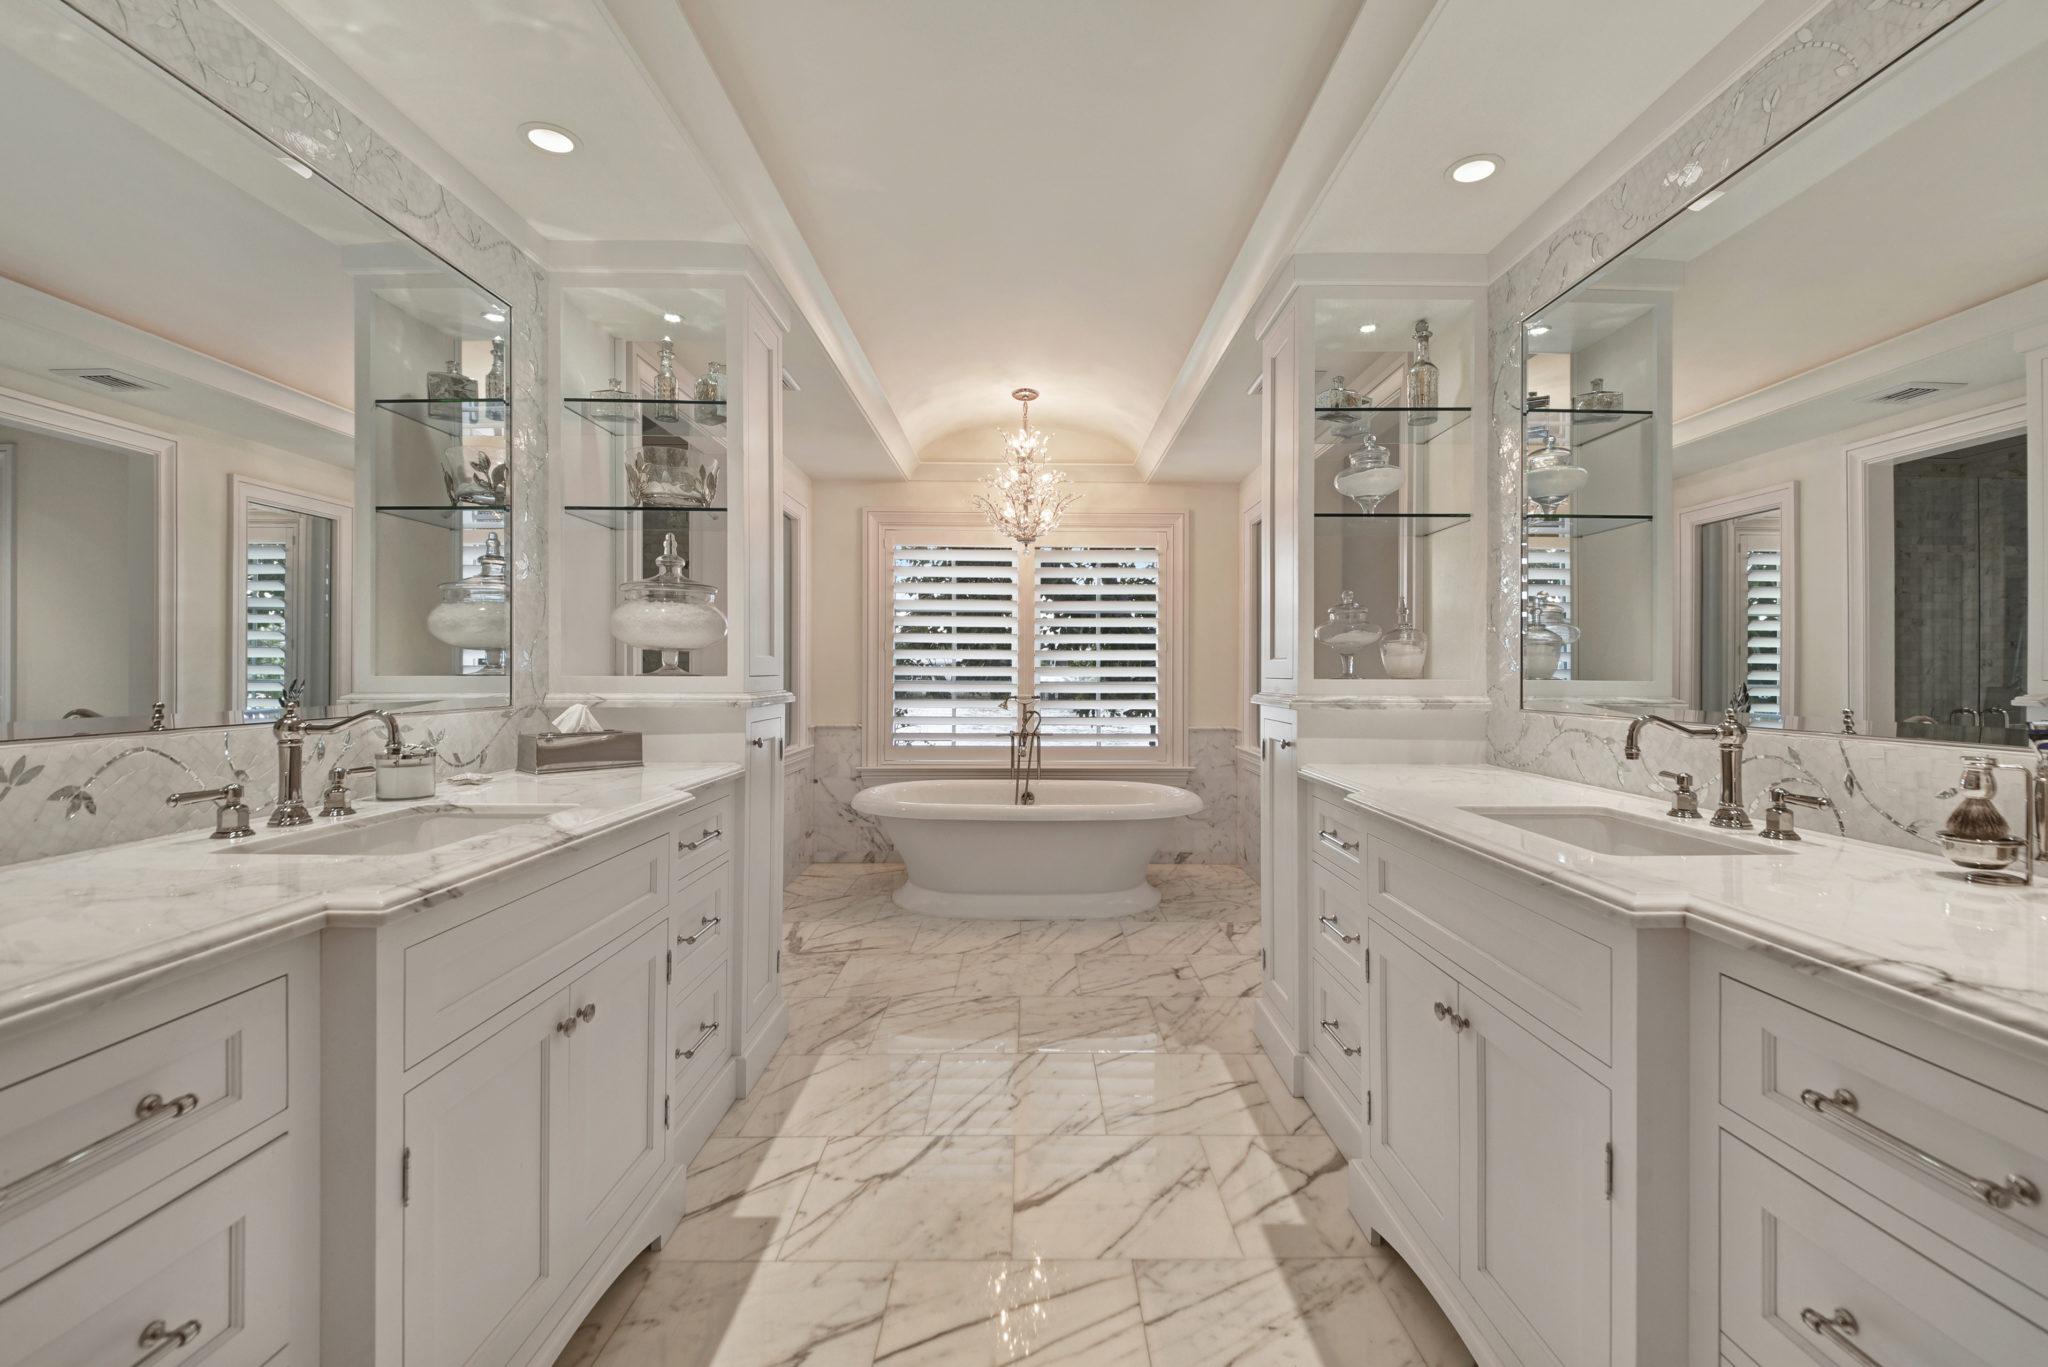 Delray Beach, FL Residence 8 - Architectural Design Studios